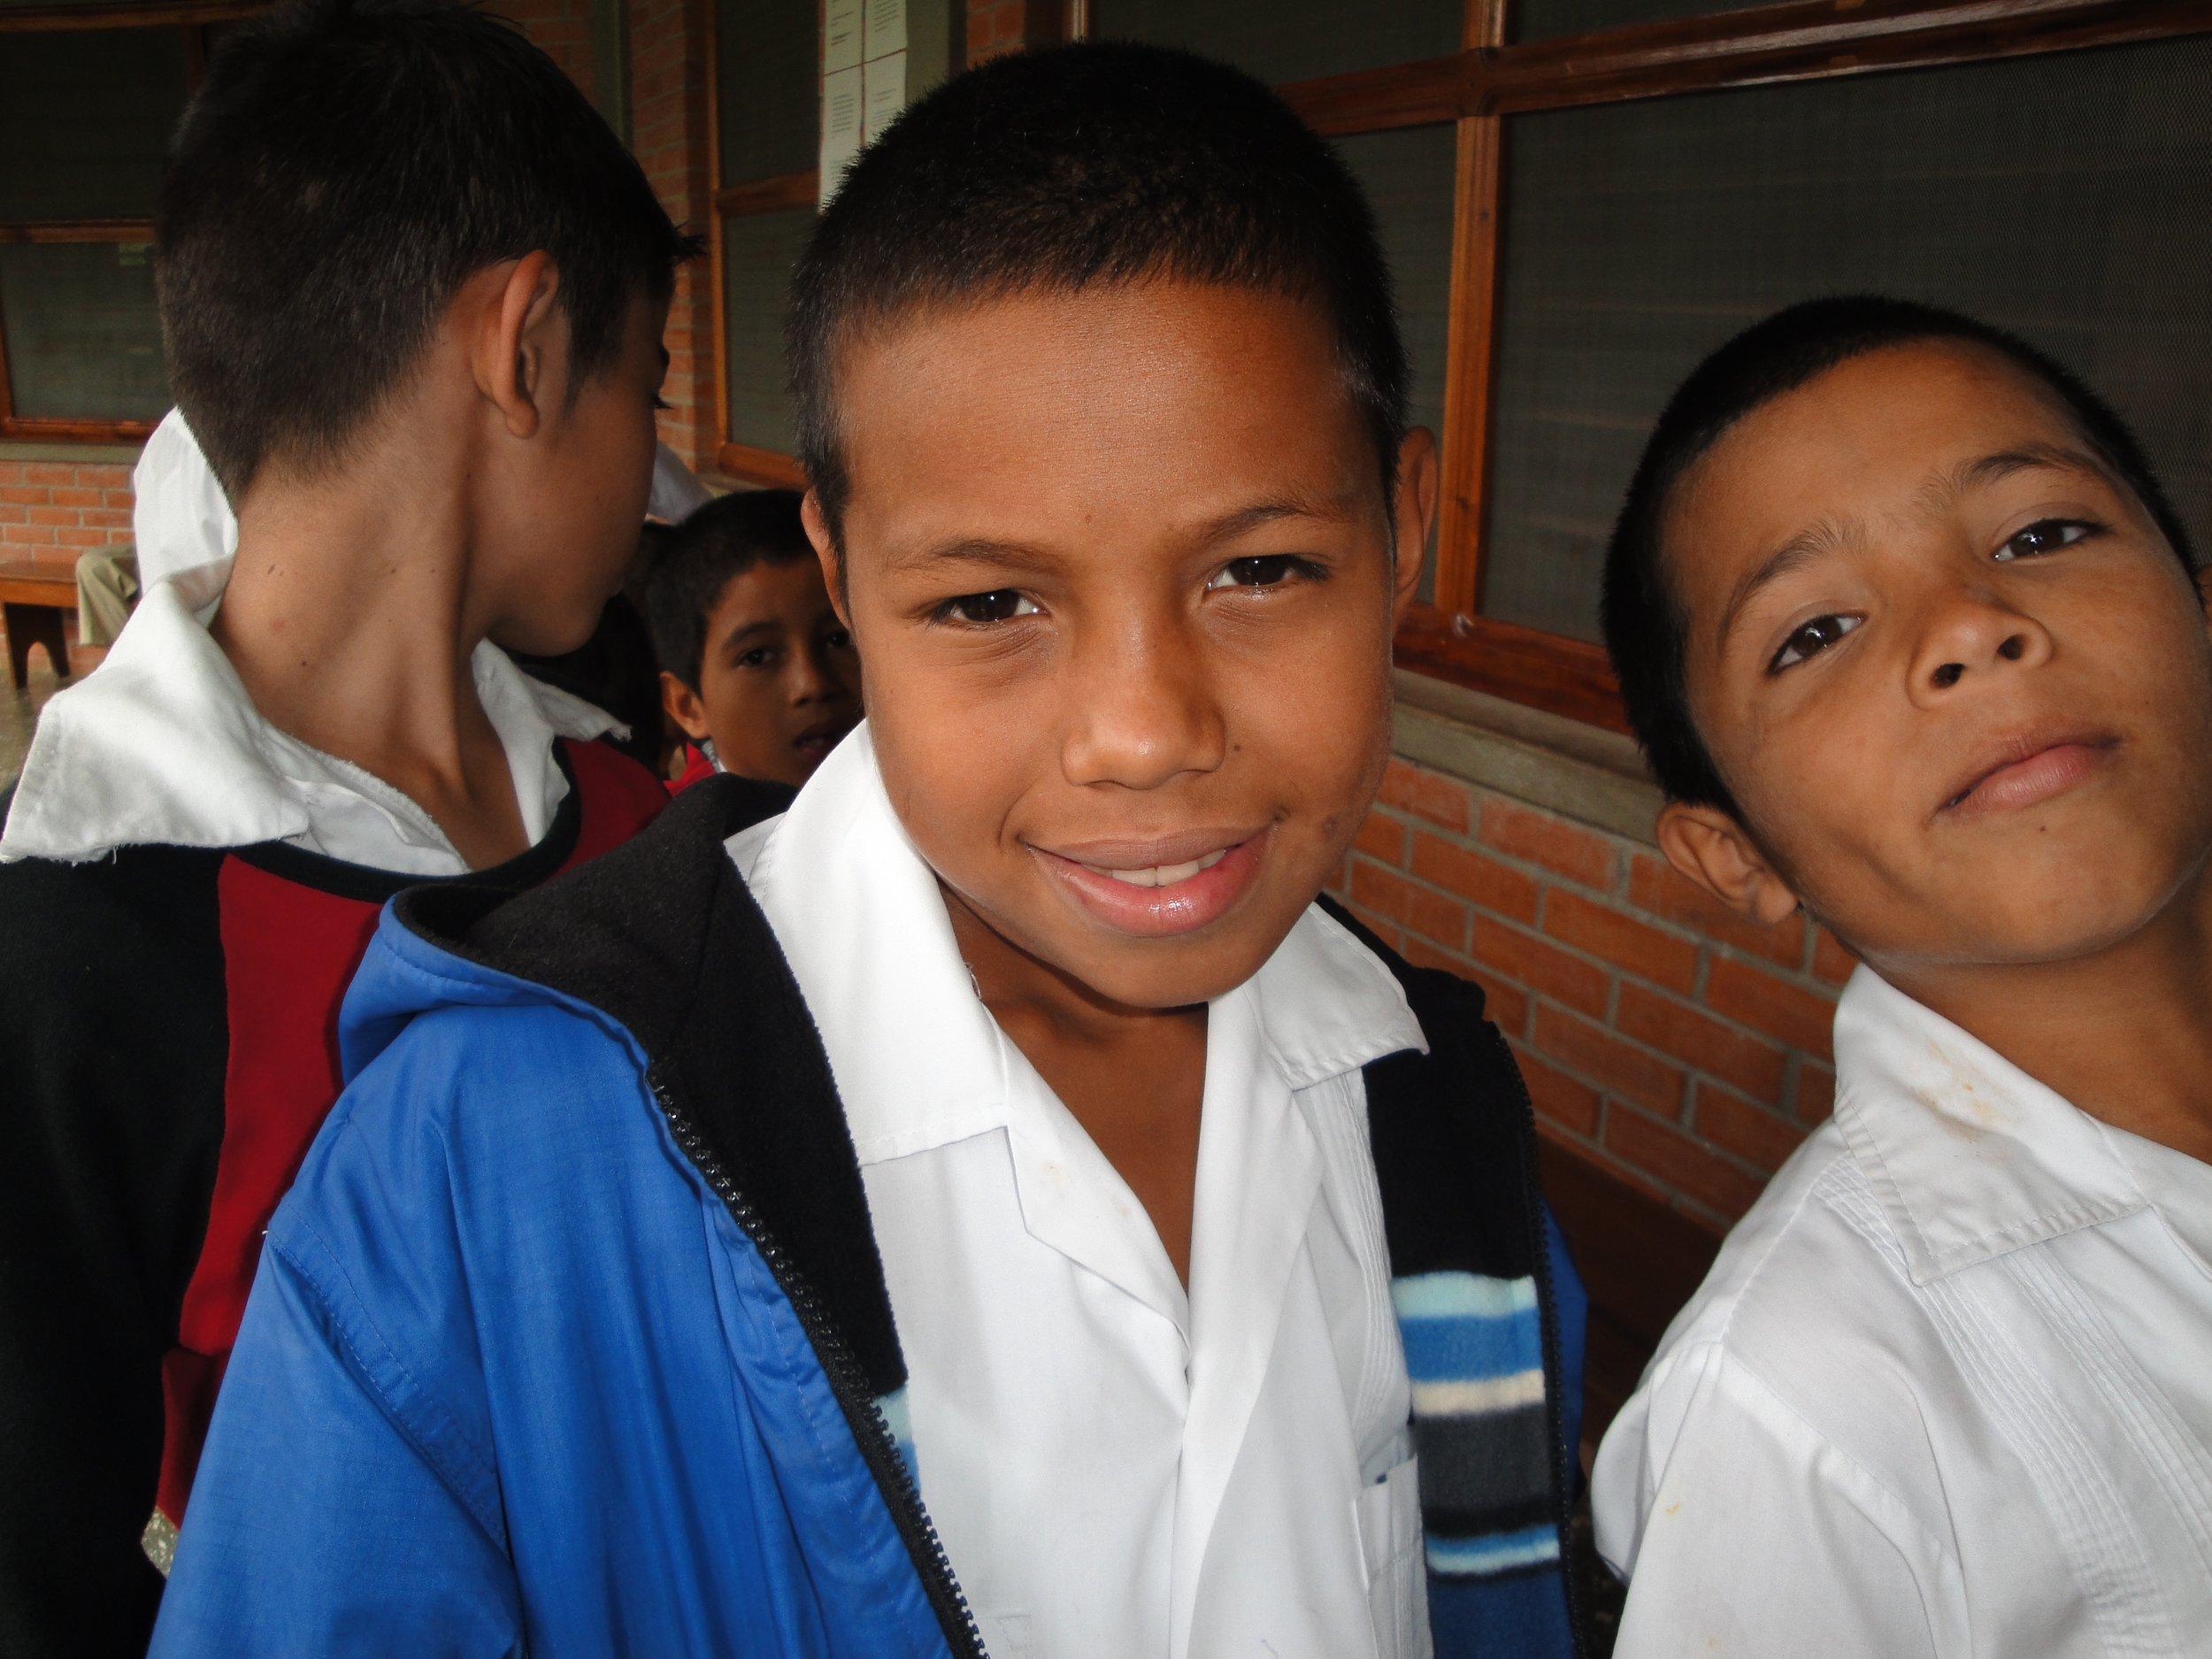 Conrad 8 years ago getting ready to head off to school.